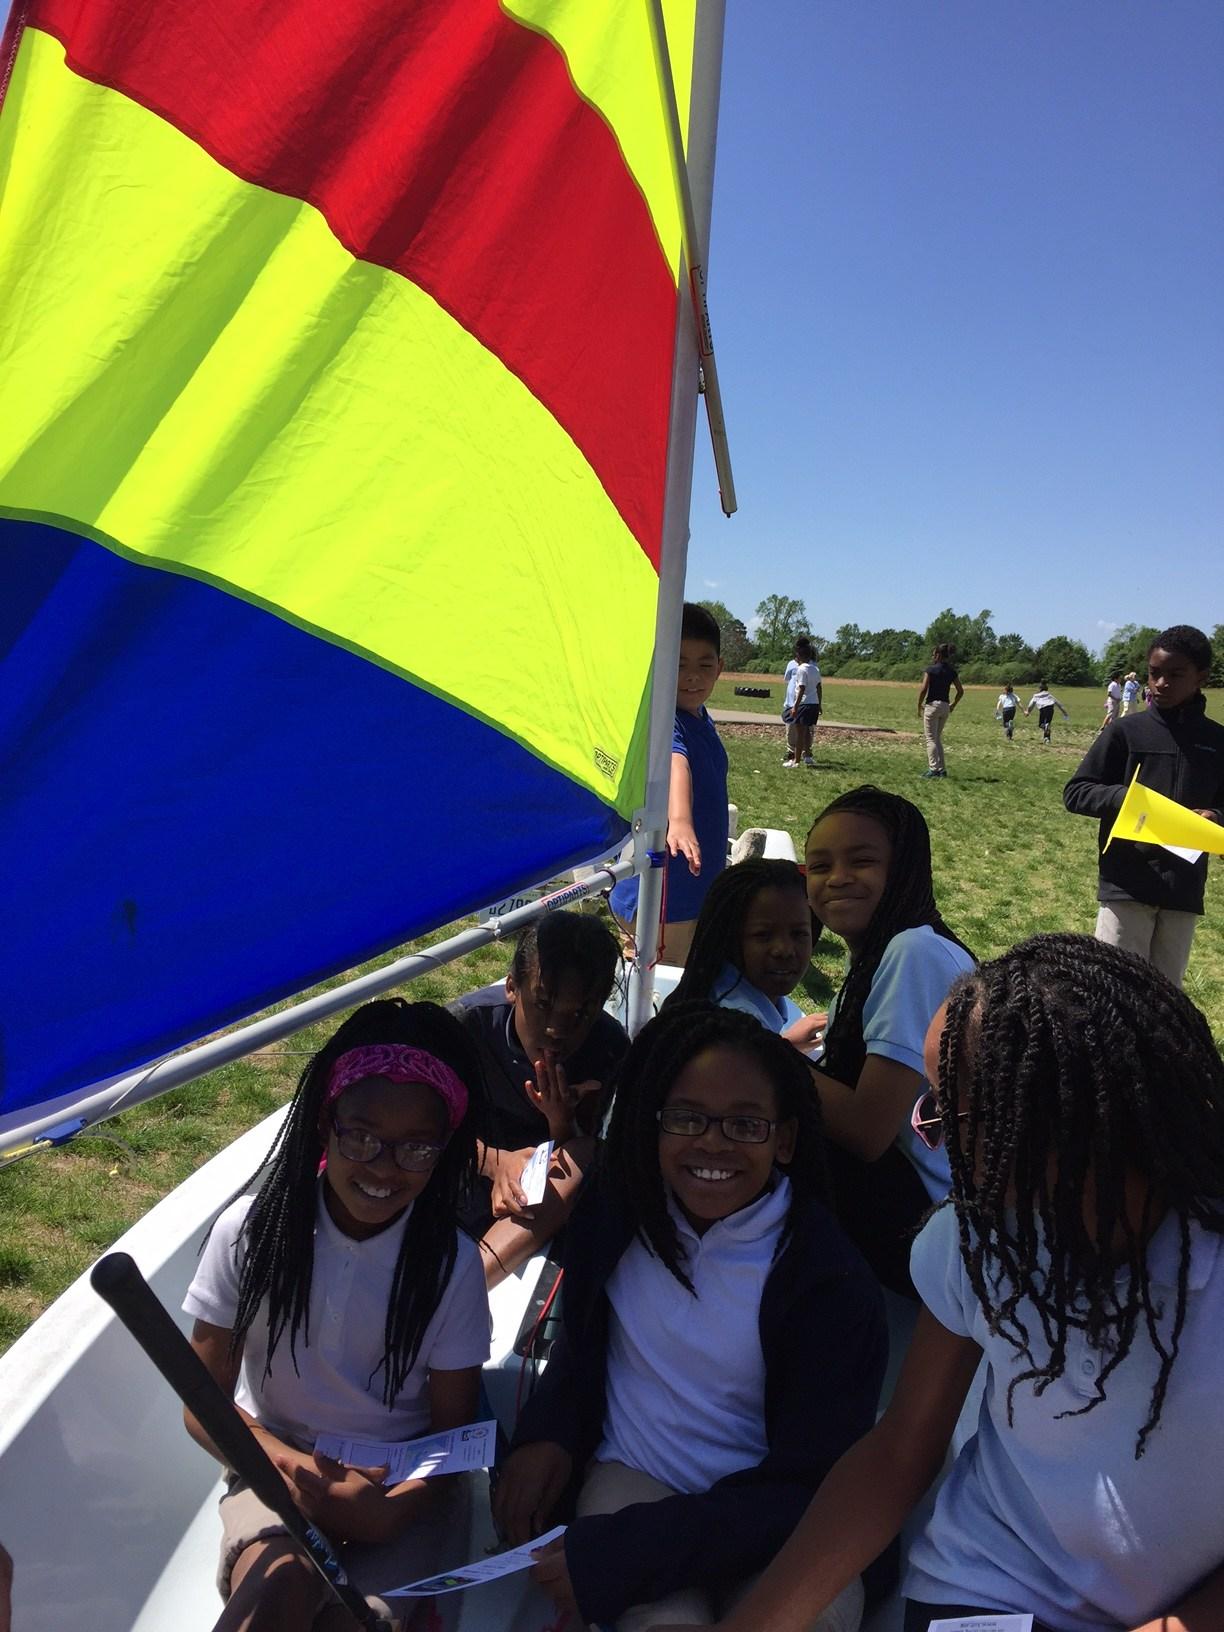 Students in backyard sail boat